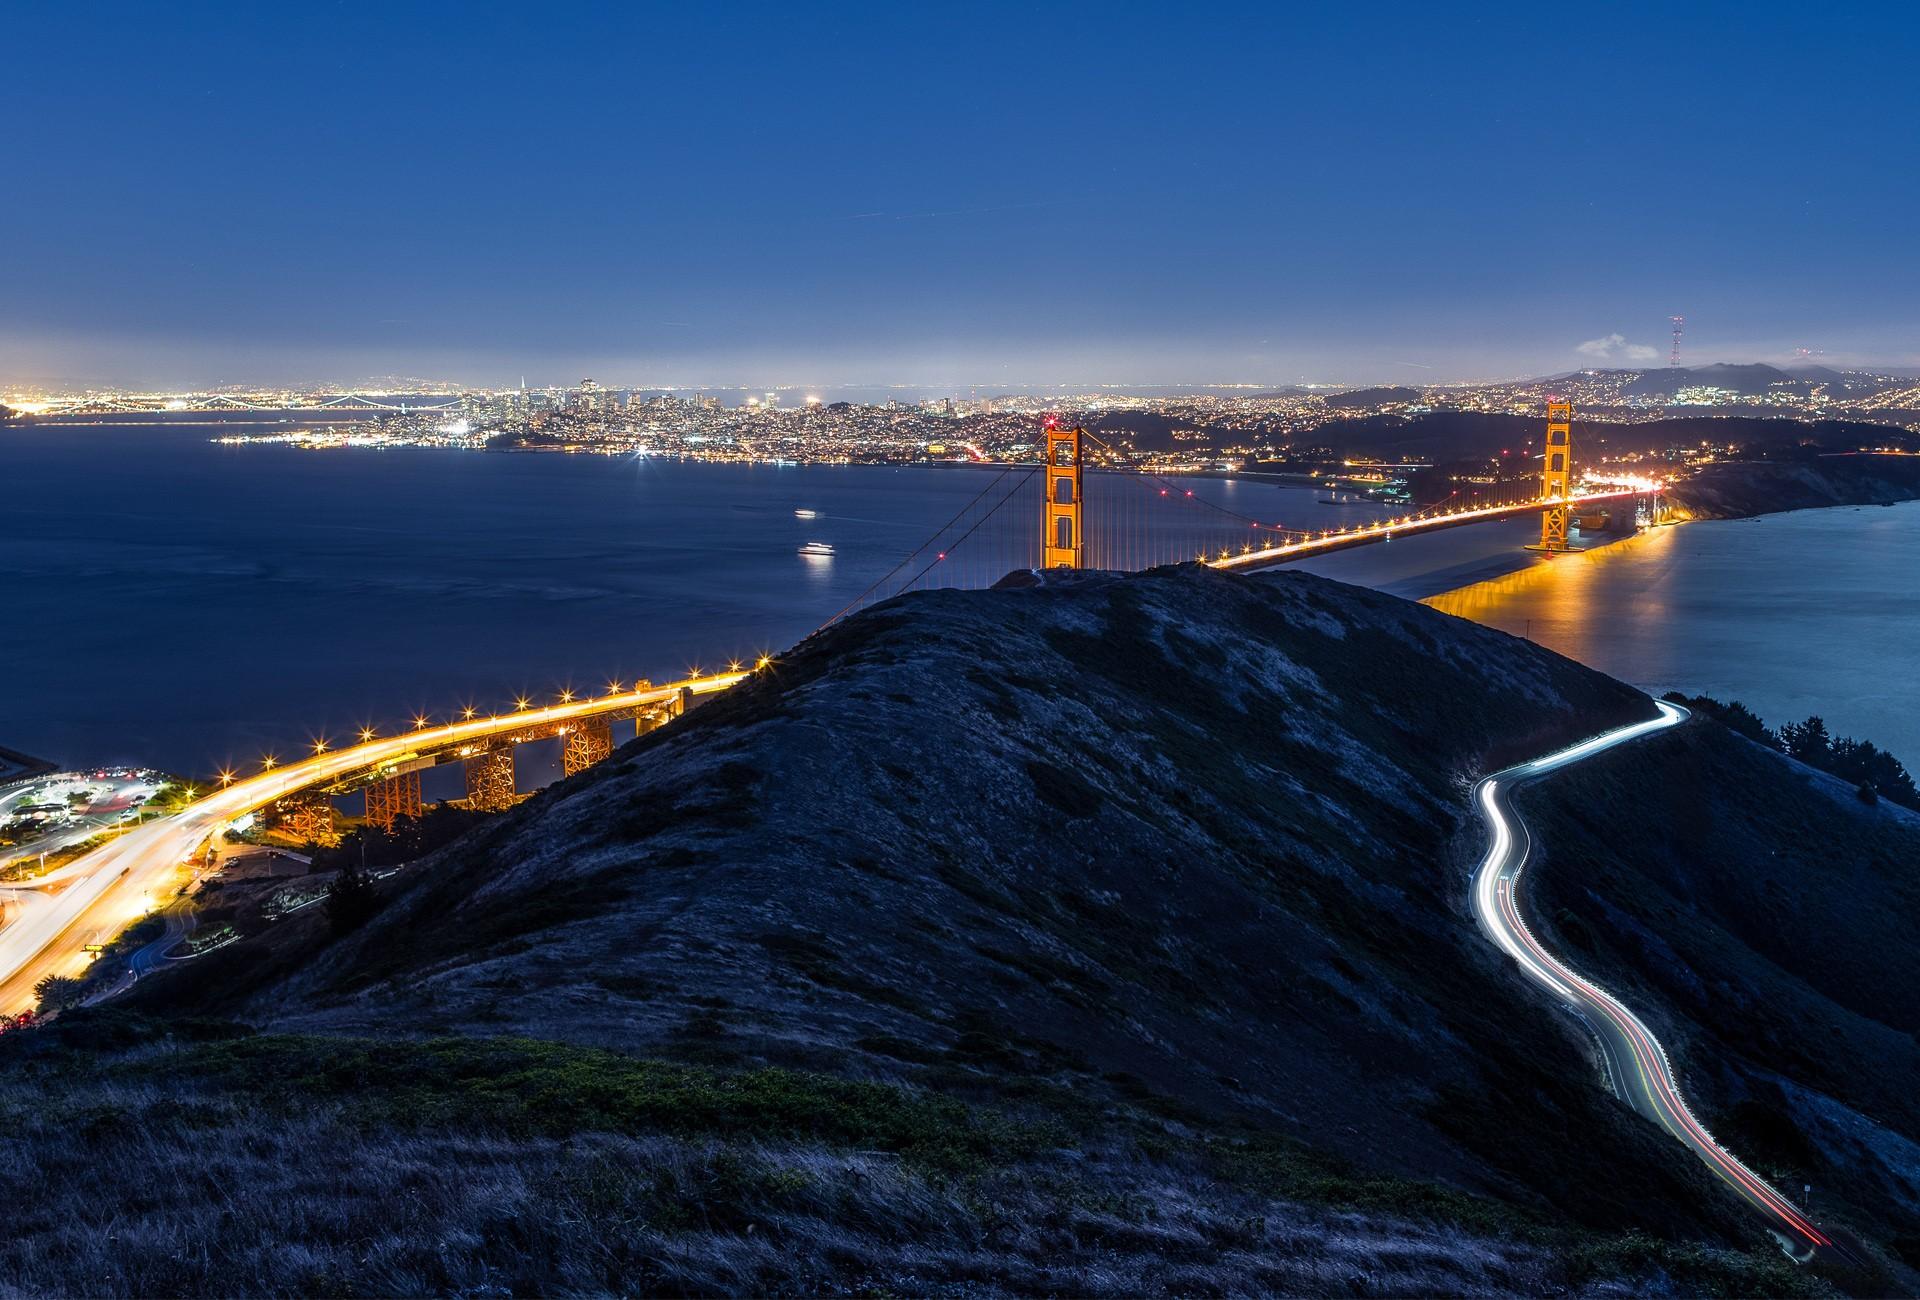 Amazing Wallpaper Night Golden Gate Bridge - Golden-Gate-Wallpaper-18-1920x1300  Pictures-55249.jpg